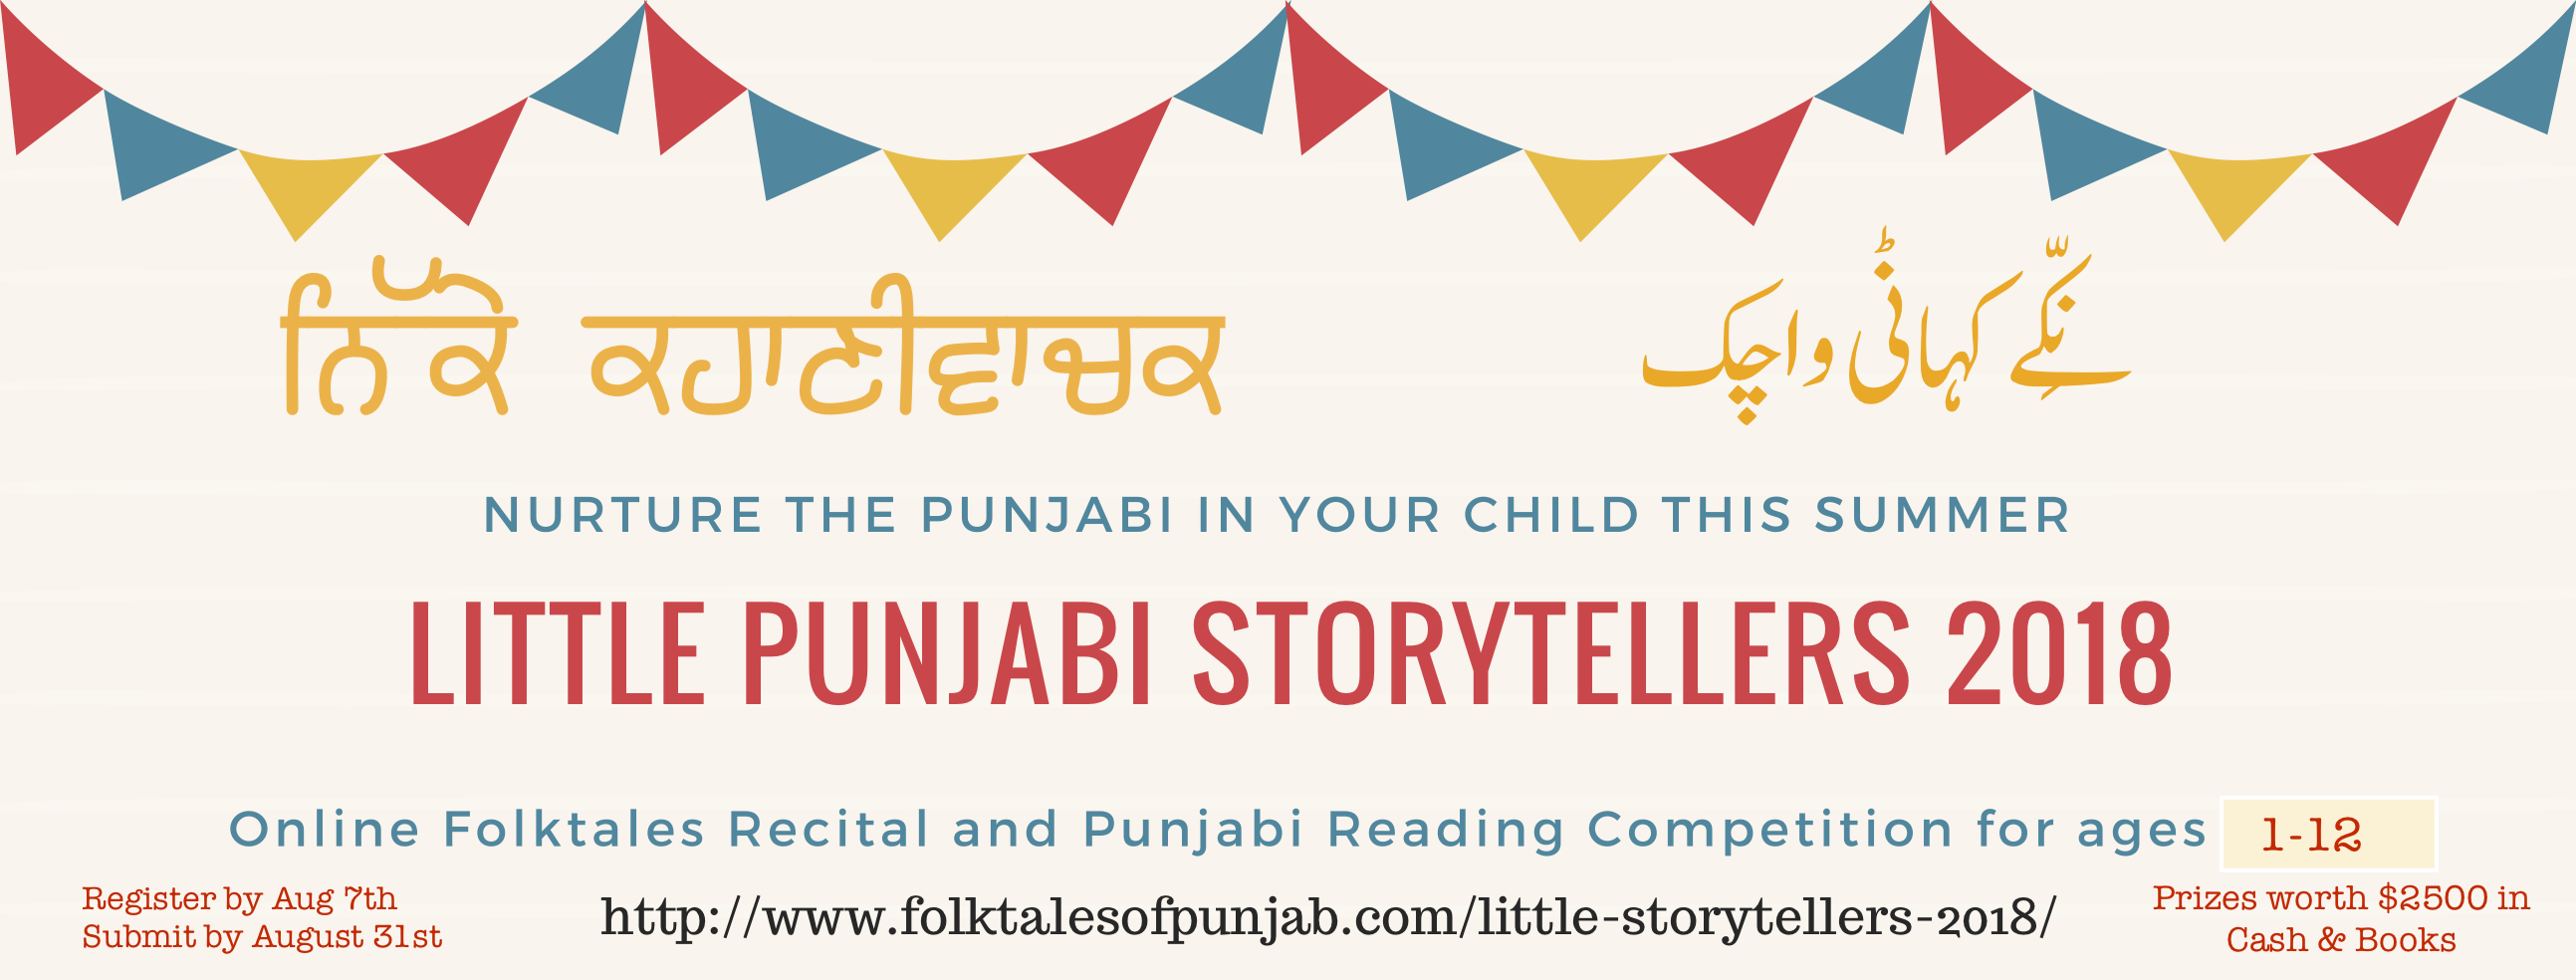 Little Punjabi Storytellers